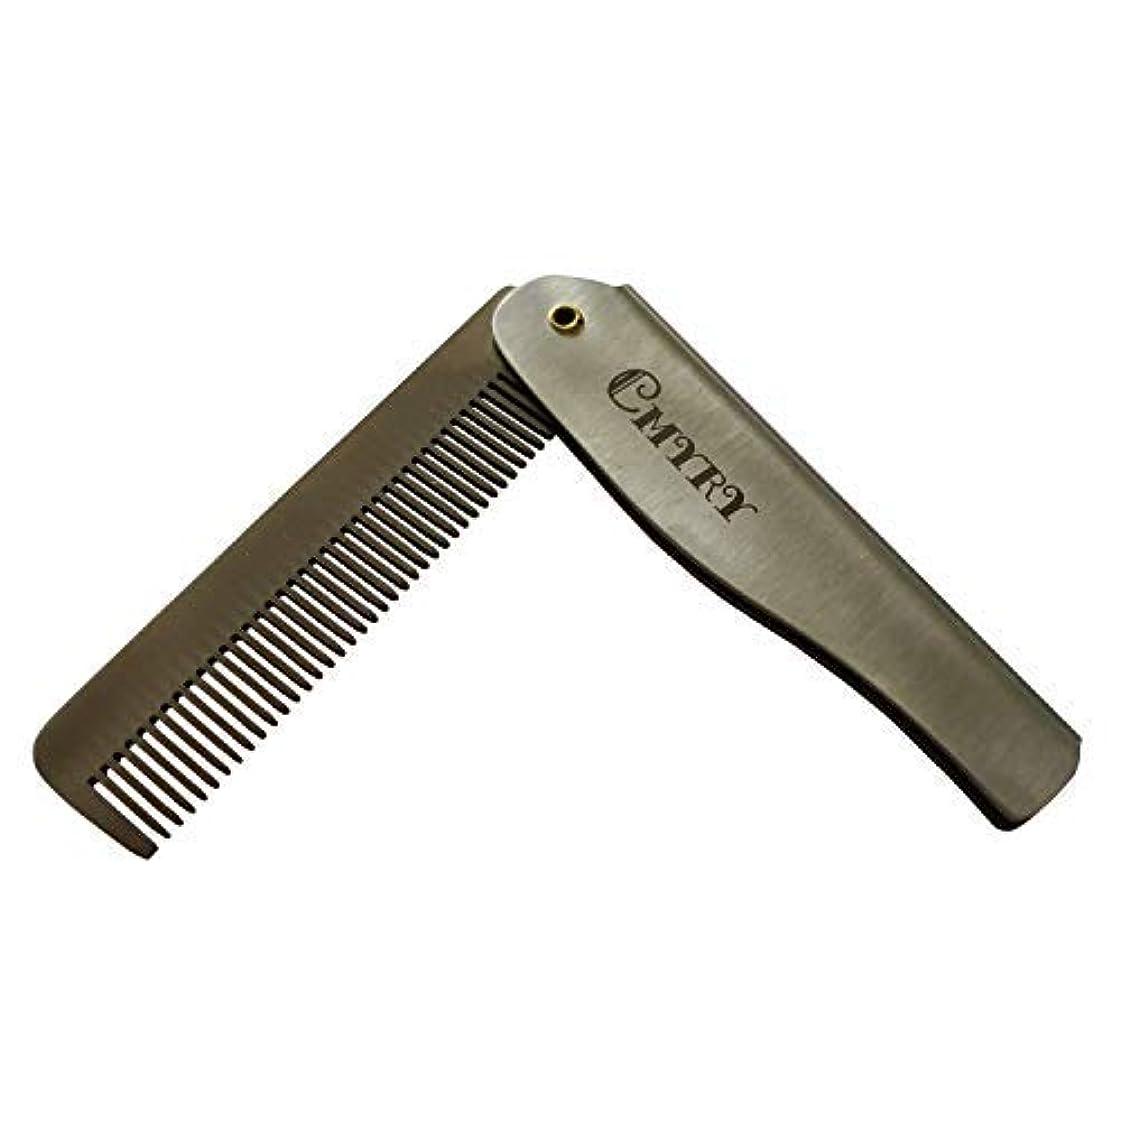 再集計診療所適性Folding Beard Hair Pocket Mustaches Pouch Comb Durable Anti-Static Comb for Men [並行輸入品]